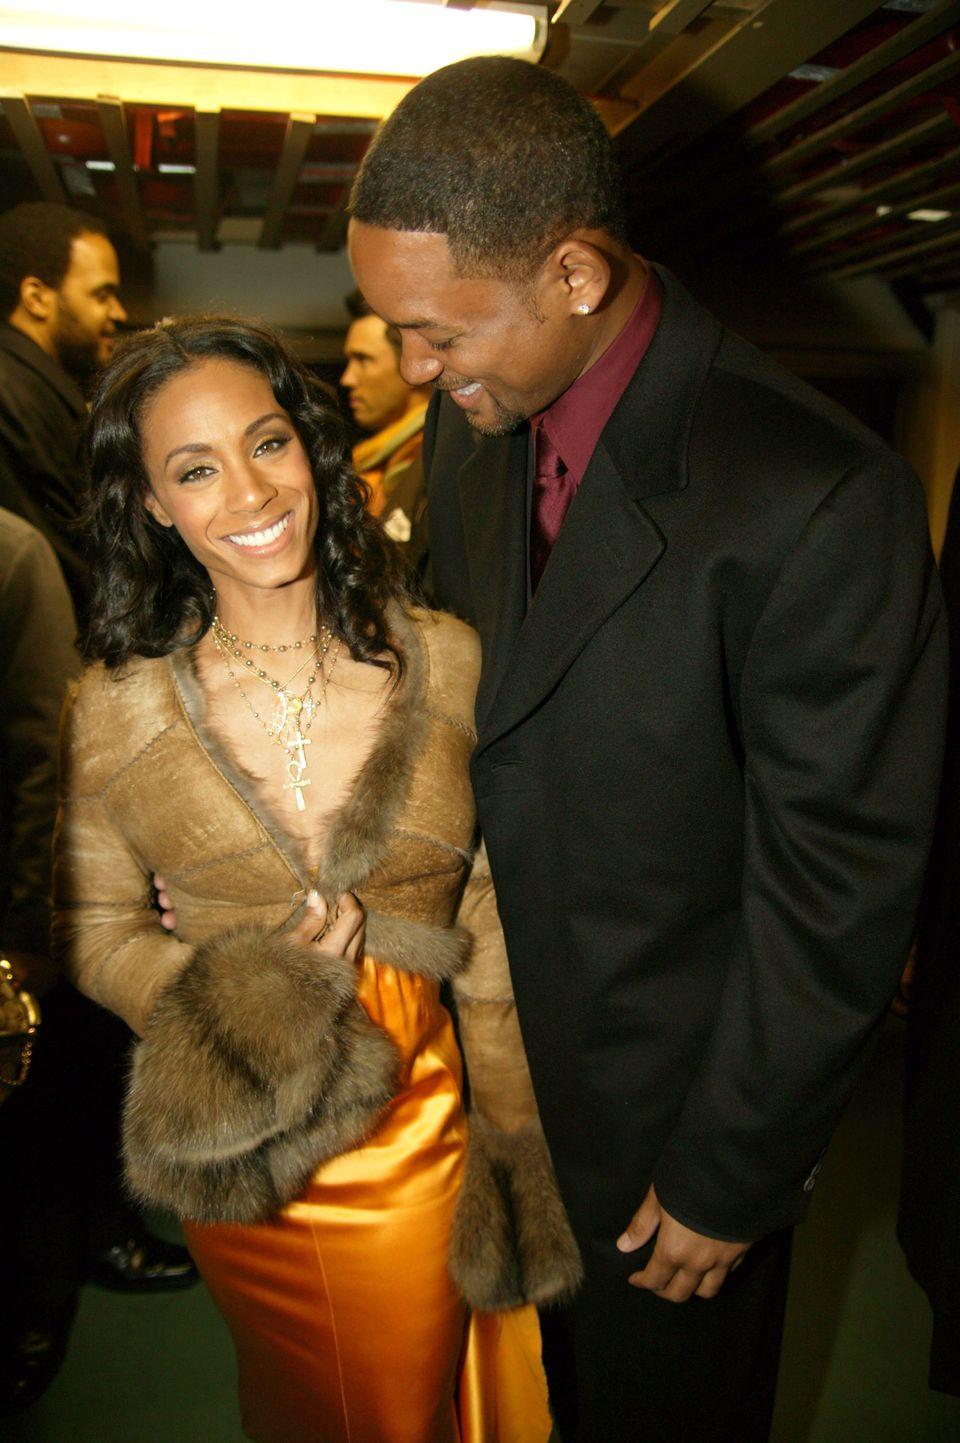 "This <a href=""http://omg.yahoo.com/news/rihanna-admits-she-likes-spanking-other-celebrity-tmi-20110406-181700-559.html"" targe"